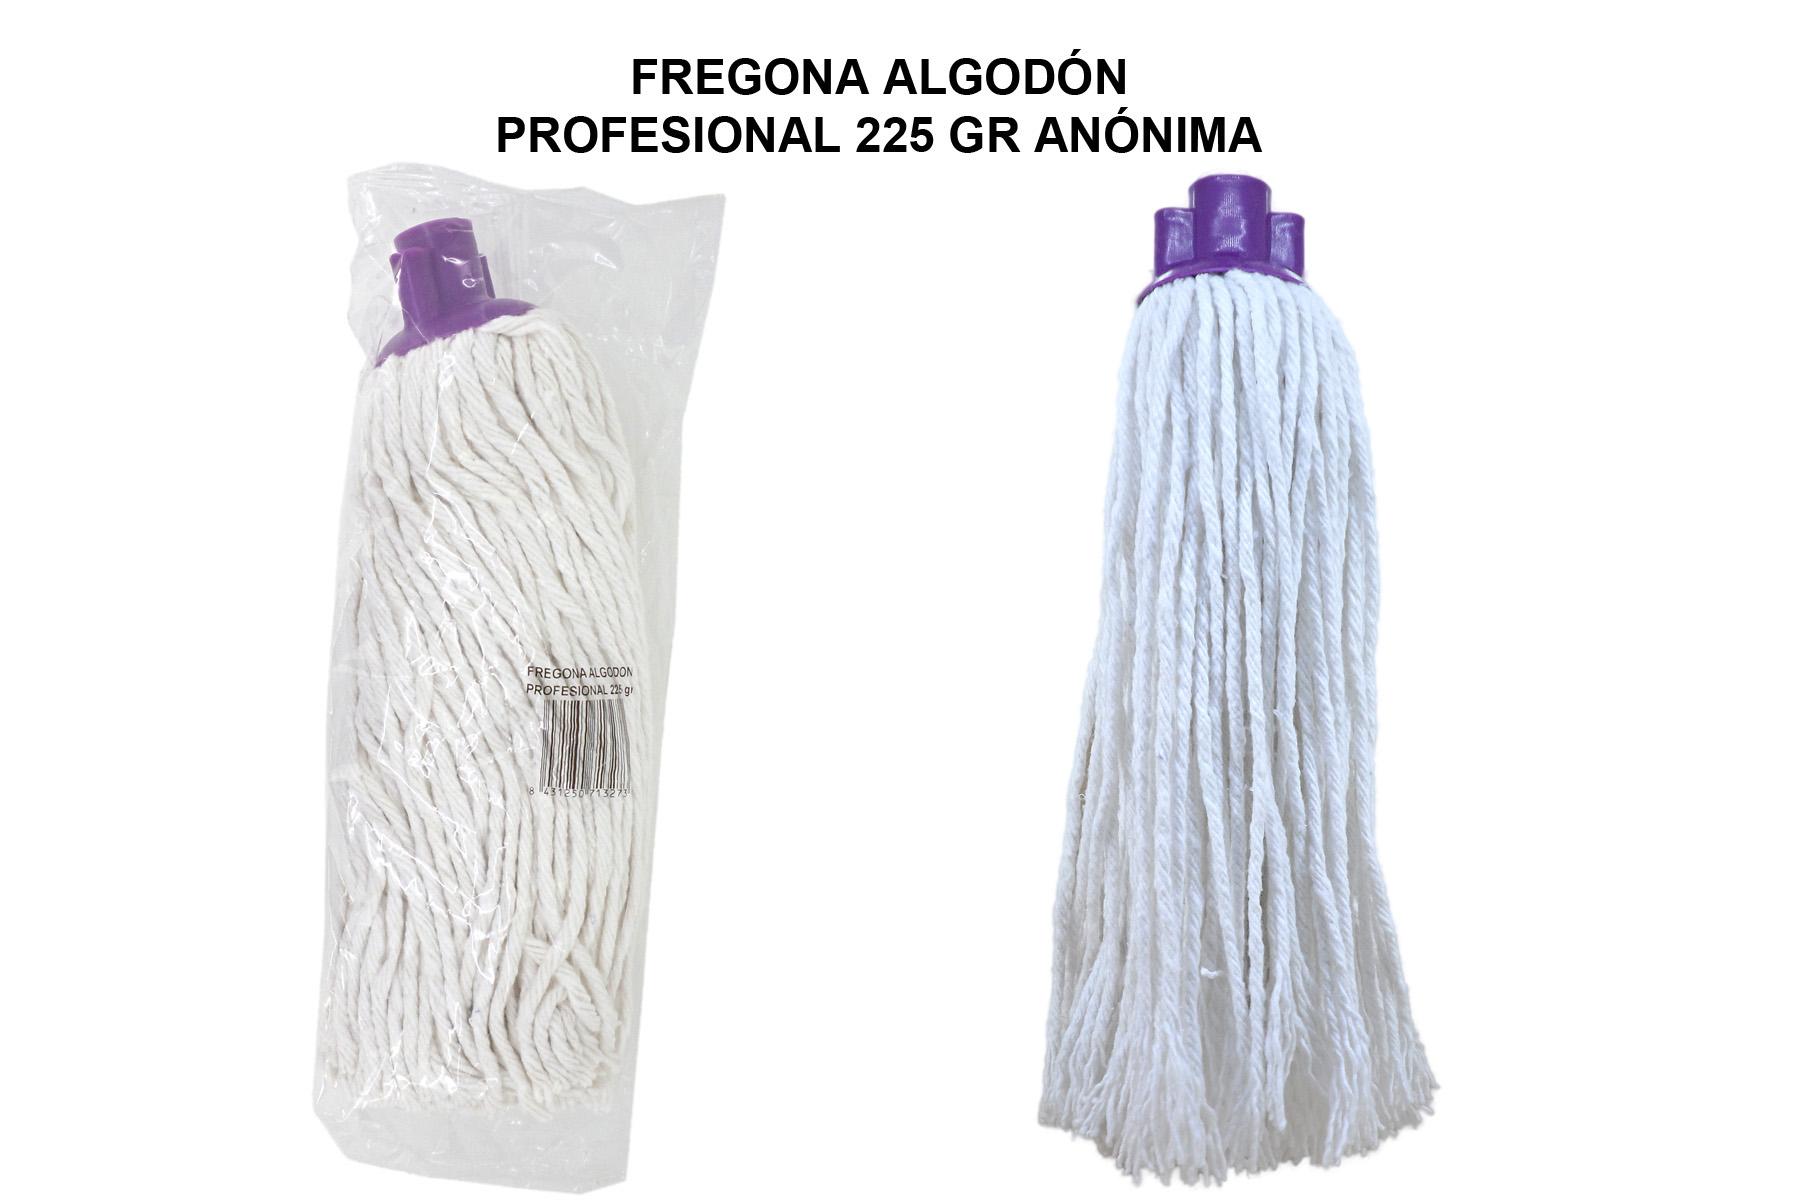 FREGONA ALGODON PROFESIONAL 225 GR ANONIMA